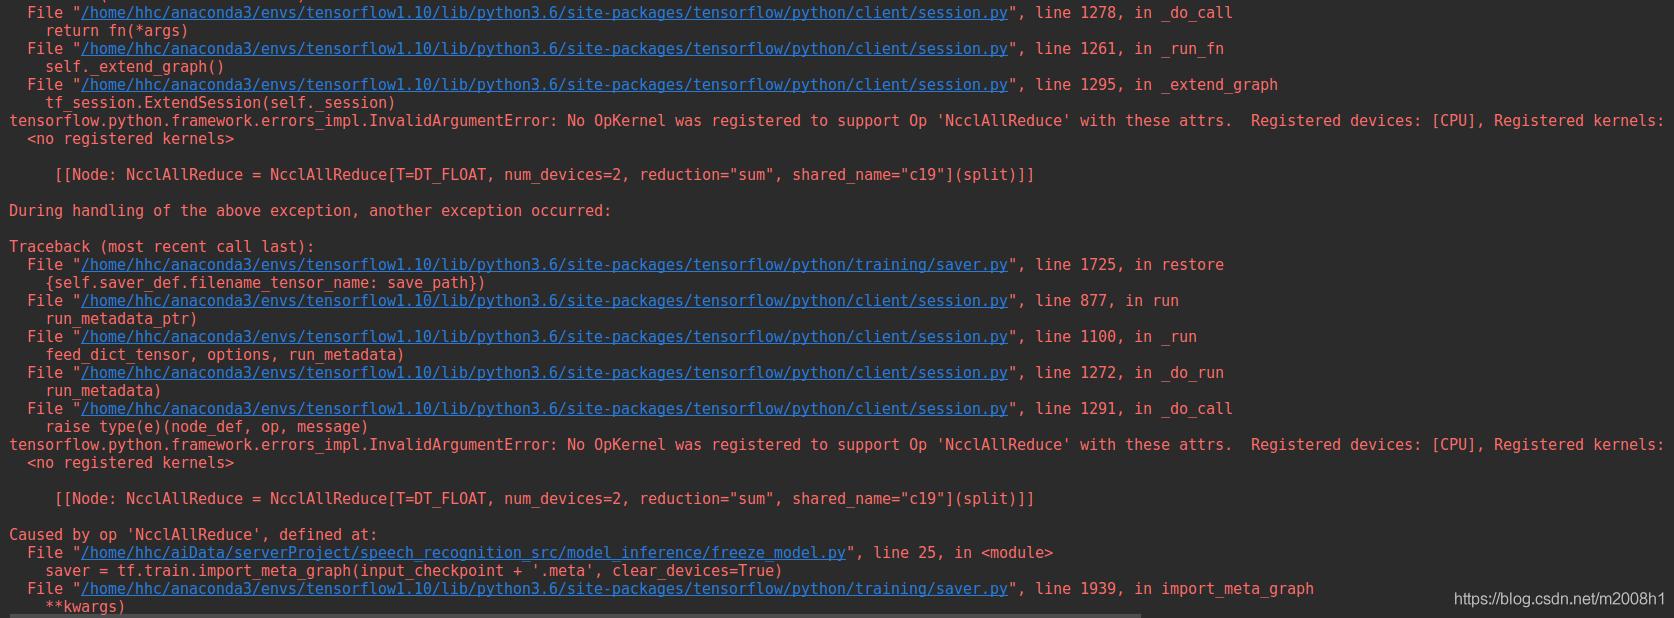 ubntu16 04 tensorflow模型ckpt转pb时遇到的问题- m2008h1的博客- CSDN博客